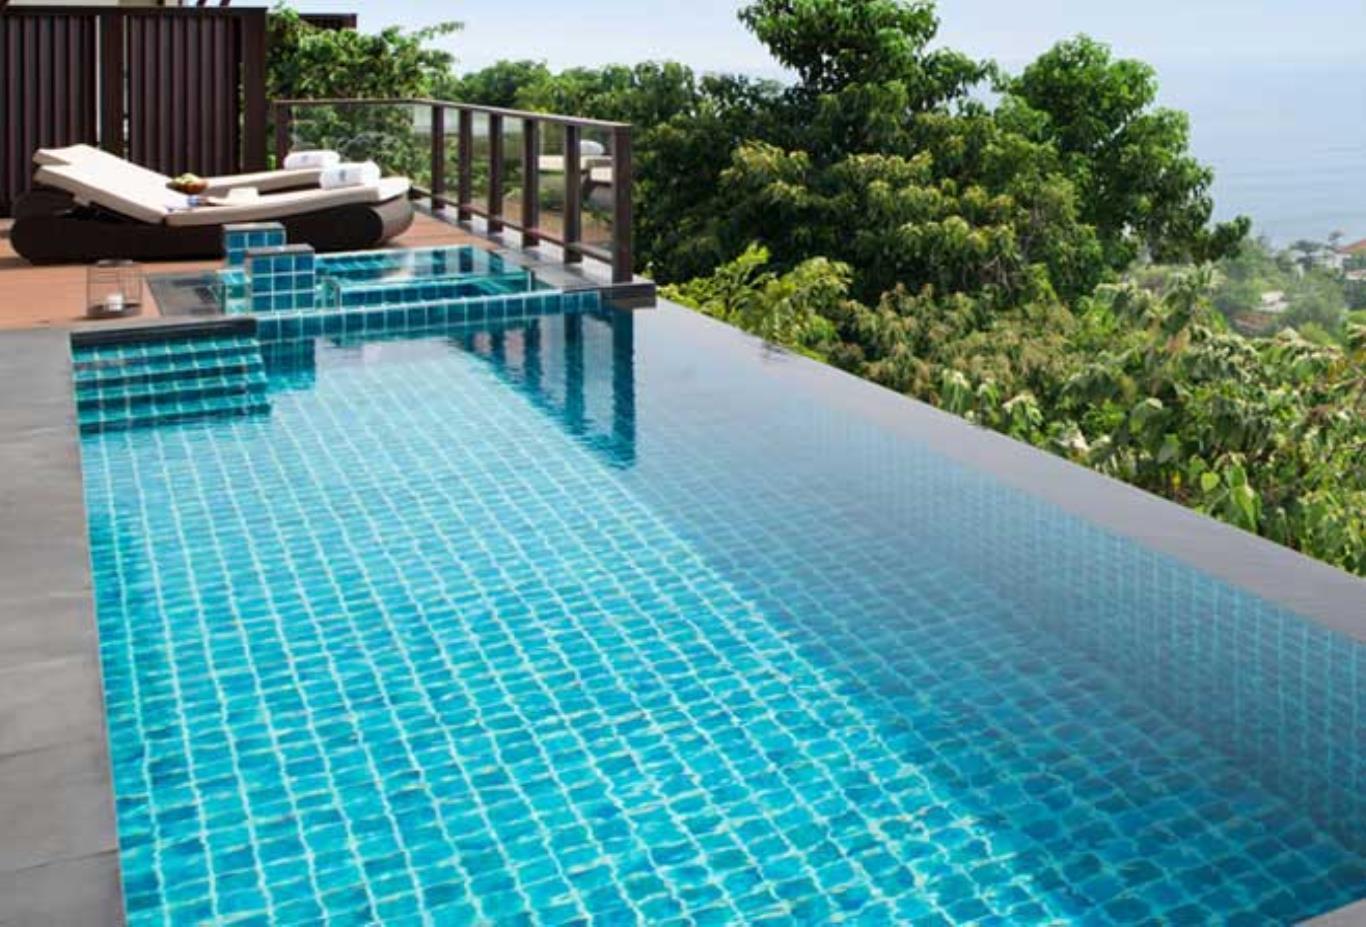 HillsidePoolVilla-2-bed-pool-